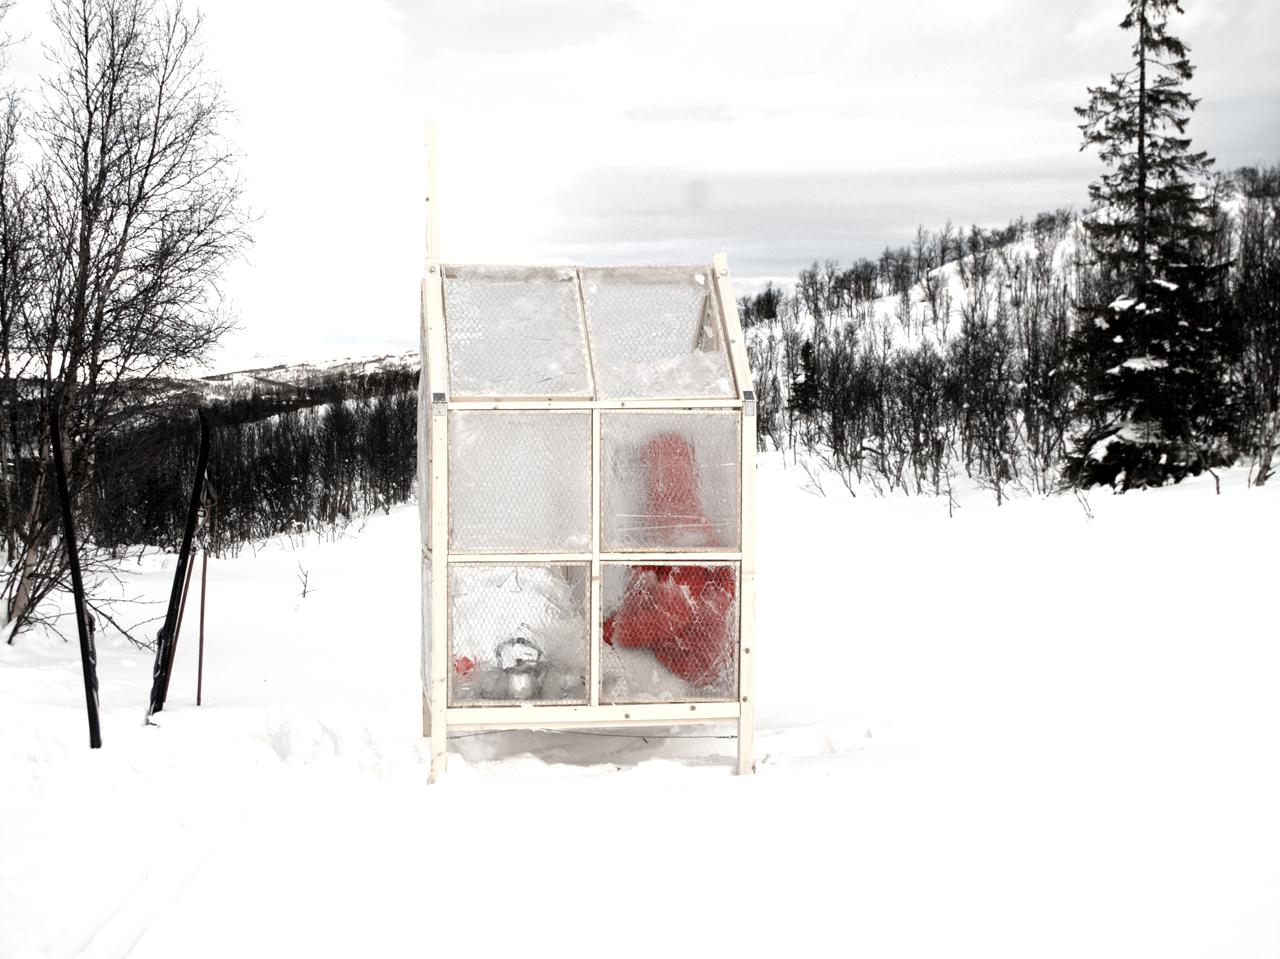 Abrigo para Pescar - 'Noun.1 Unavailability' / Gartnerfuglen Arkitekter, © Astrid Rohde Wang and Olav Lunde Arneberg